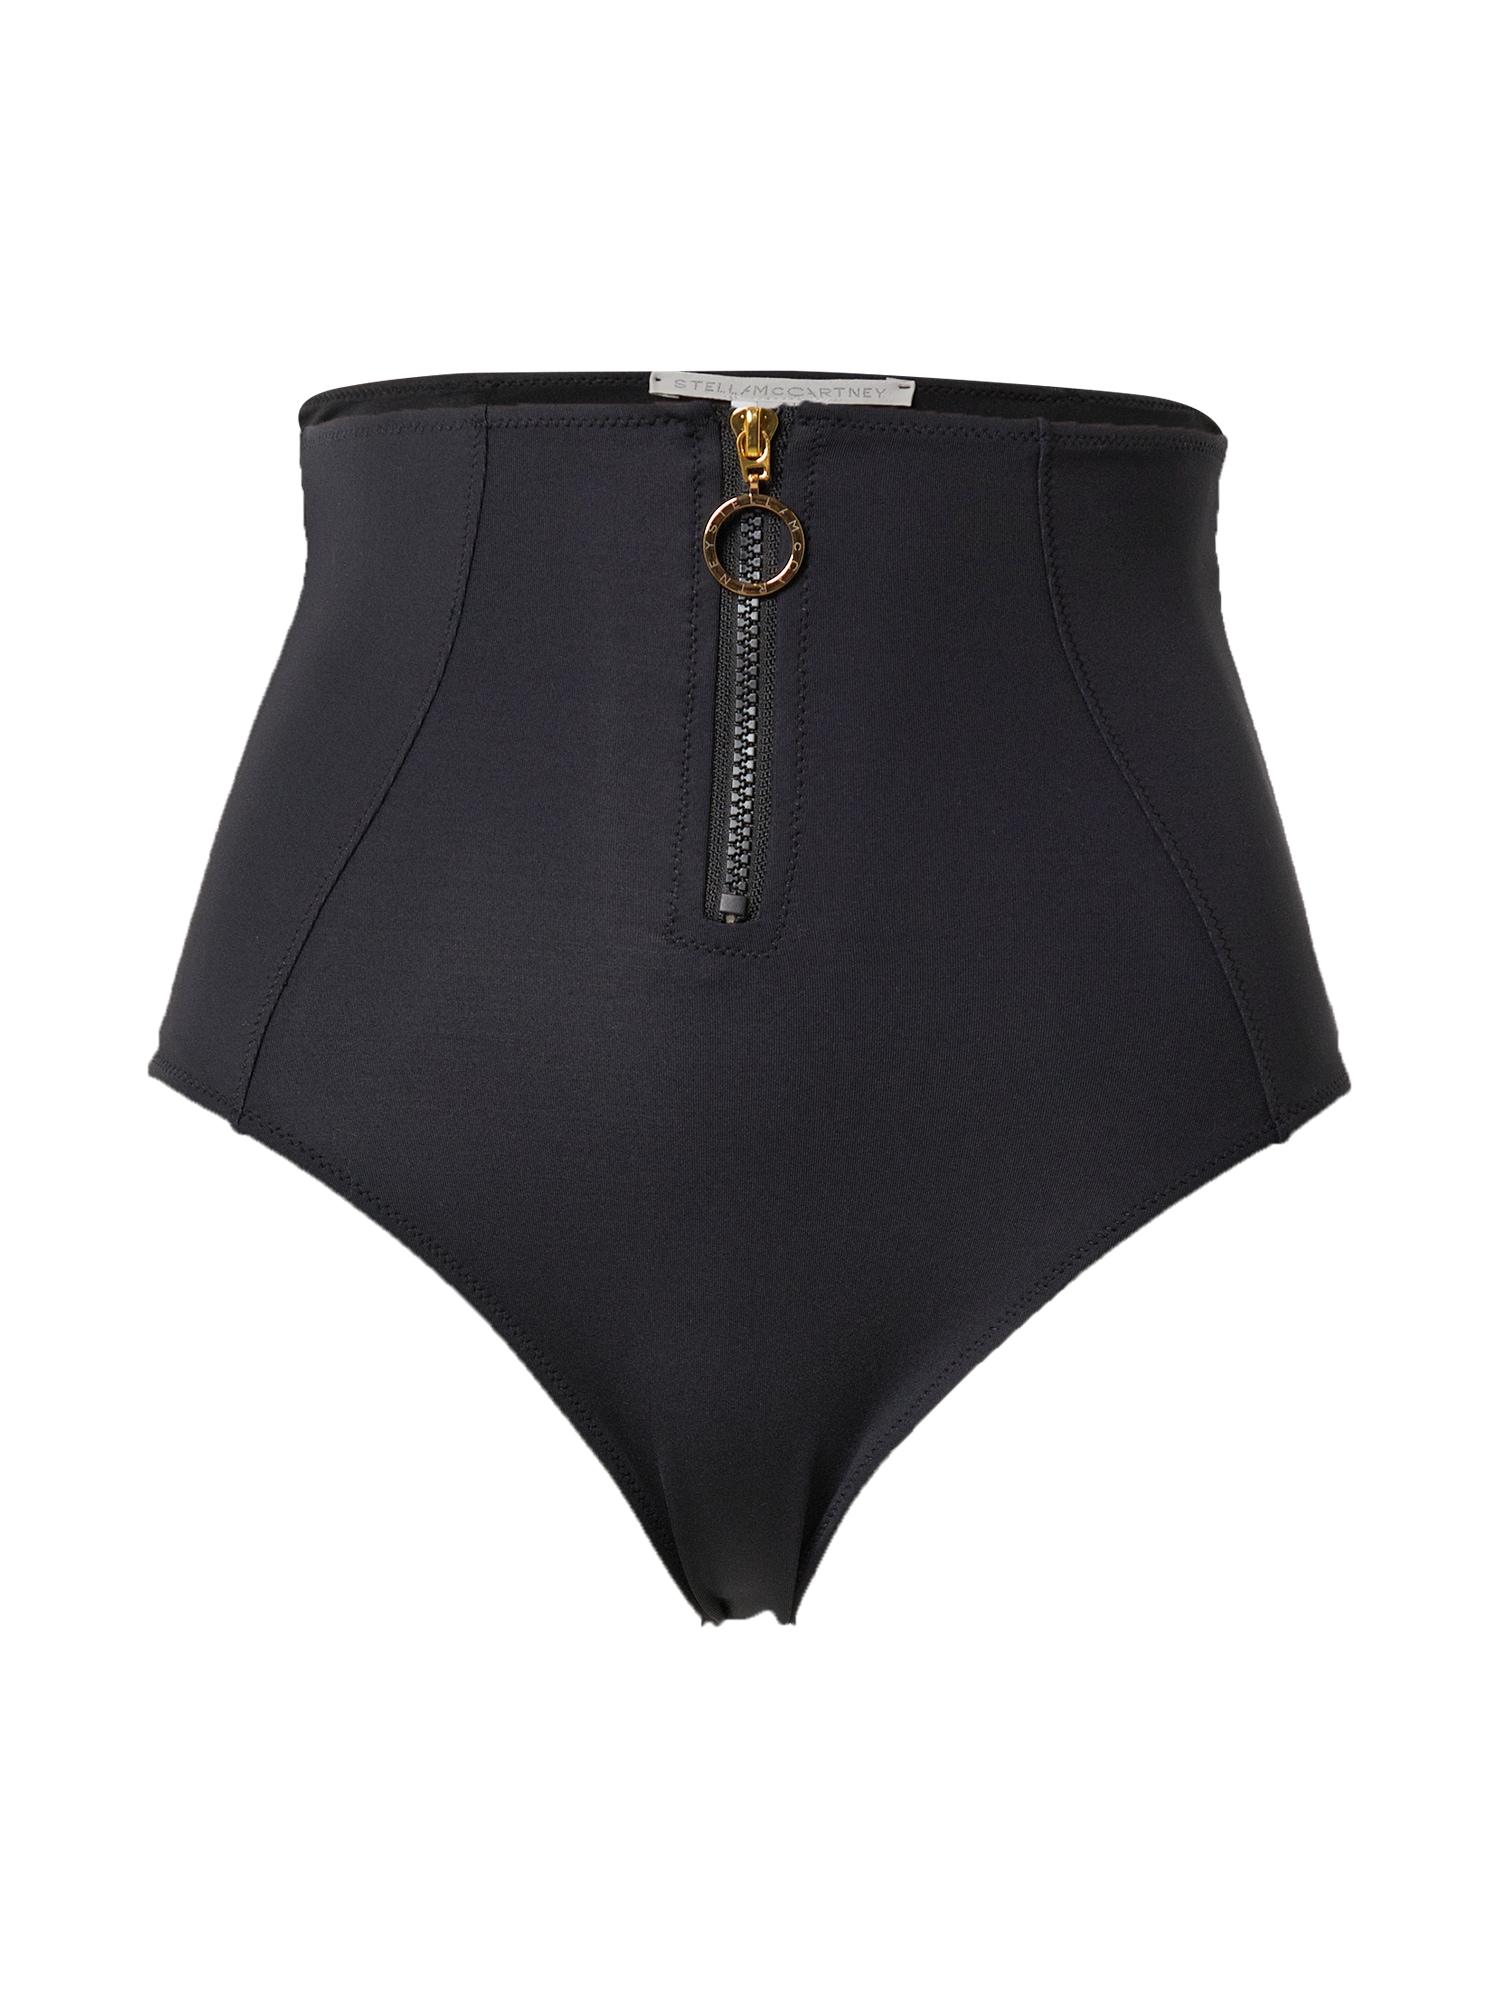 Stella McCartney Bikinio kelnaitės juoda